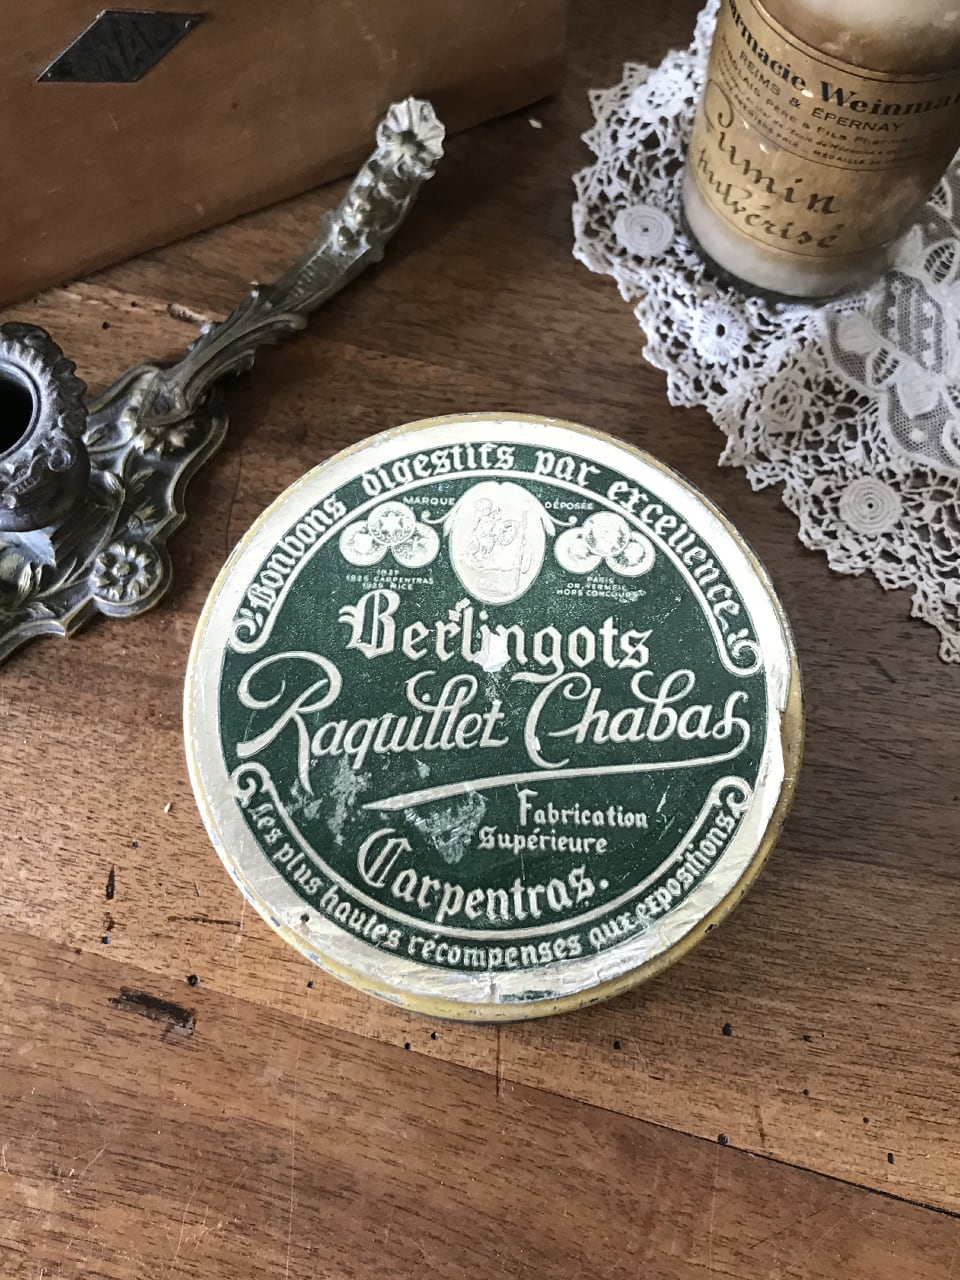 Berlingots キャンディーのTIN缶